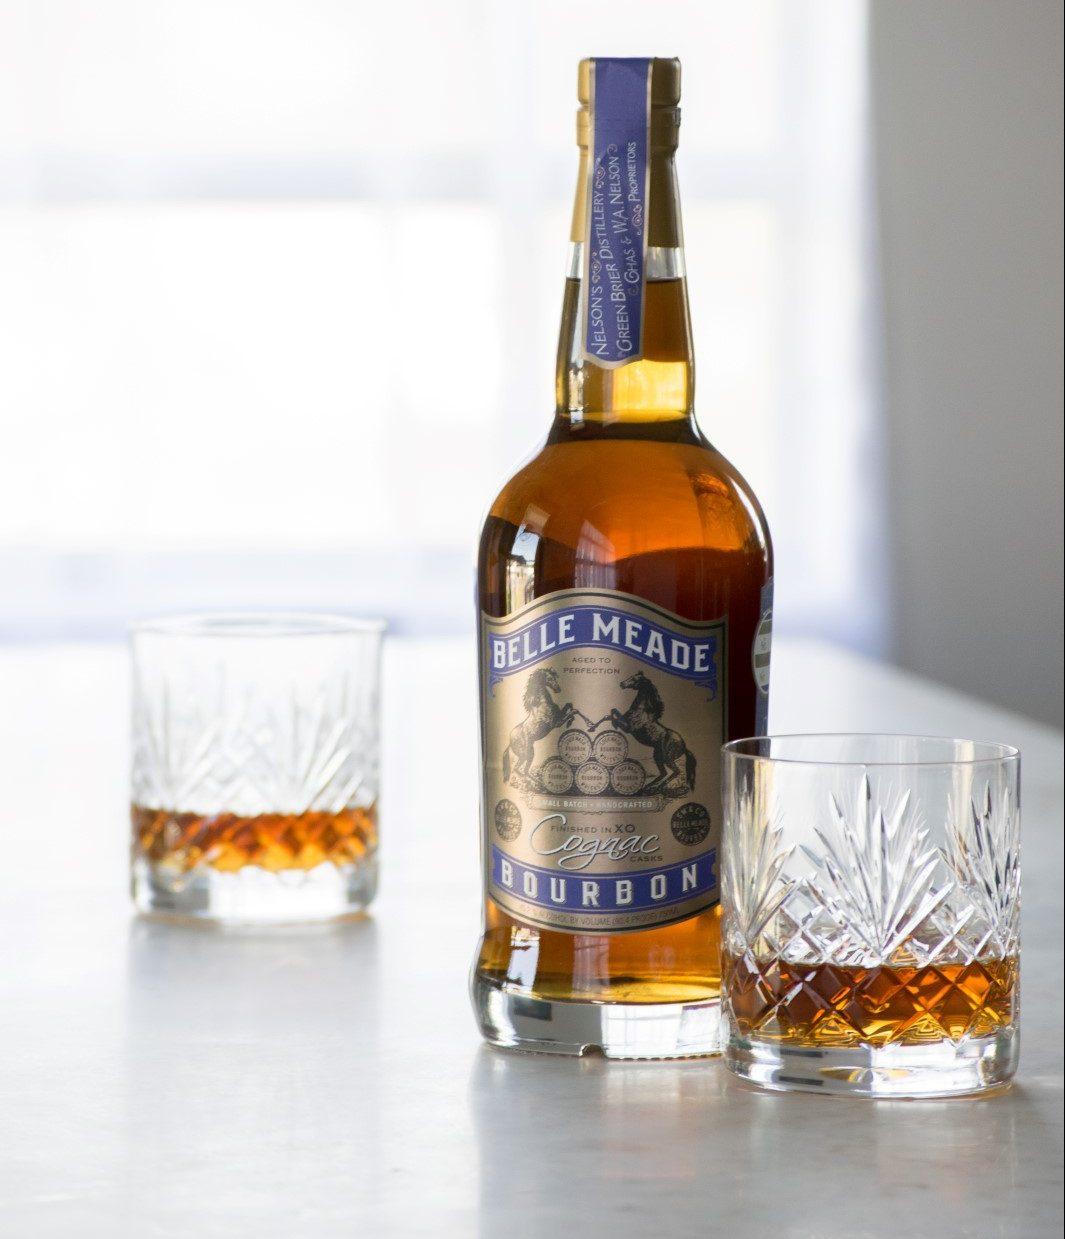 Nelson's Green Brier Belle Meade Bourbon Cognac Cask Finished